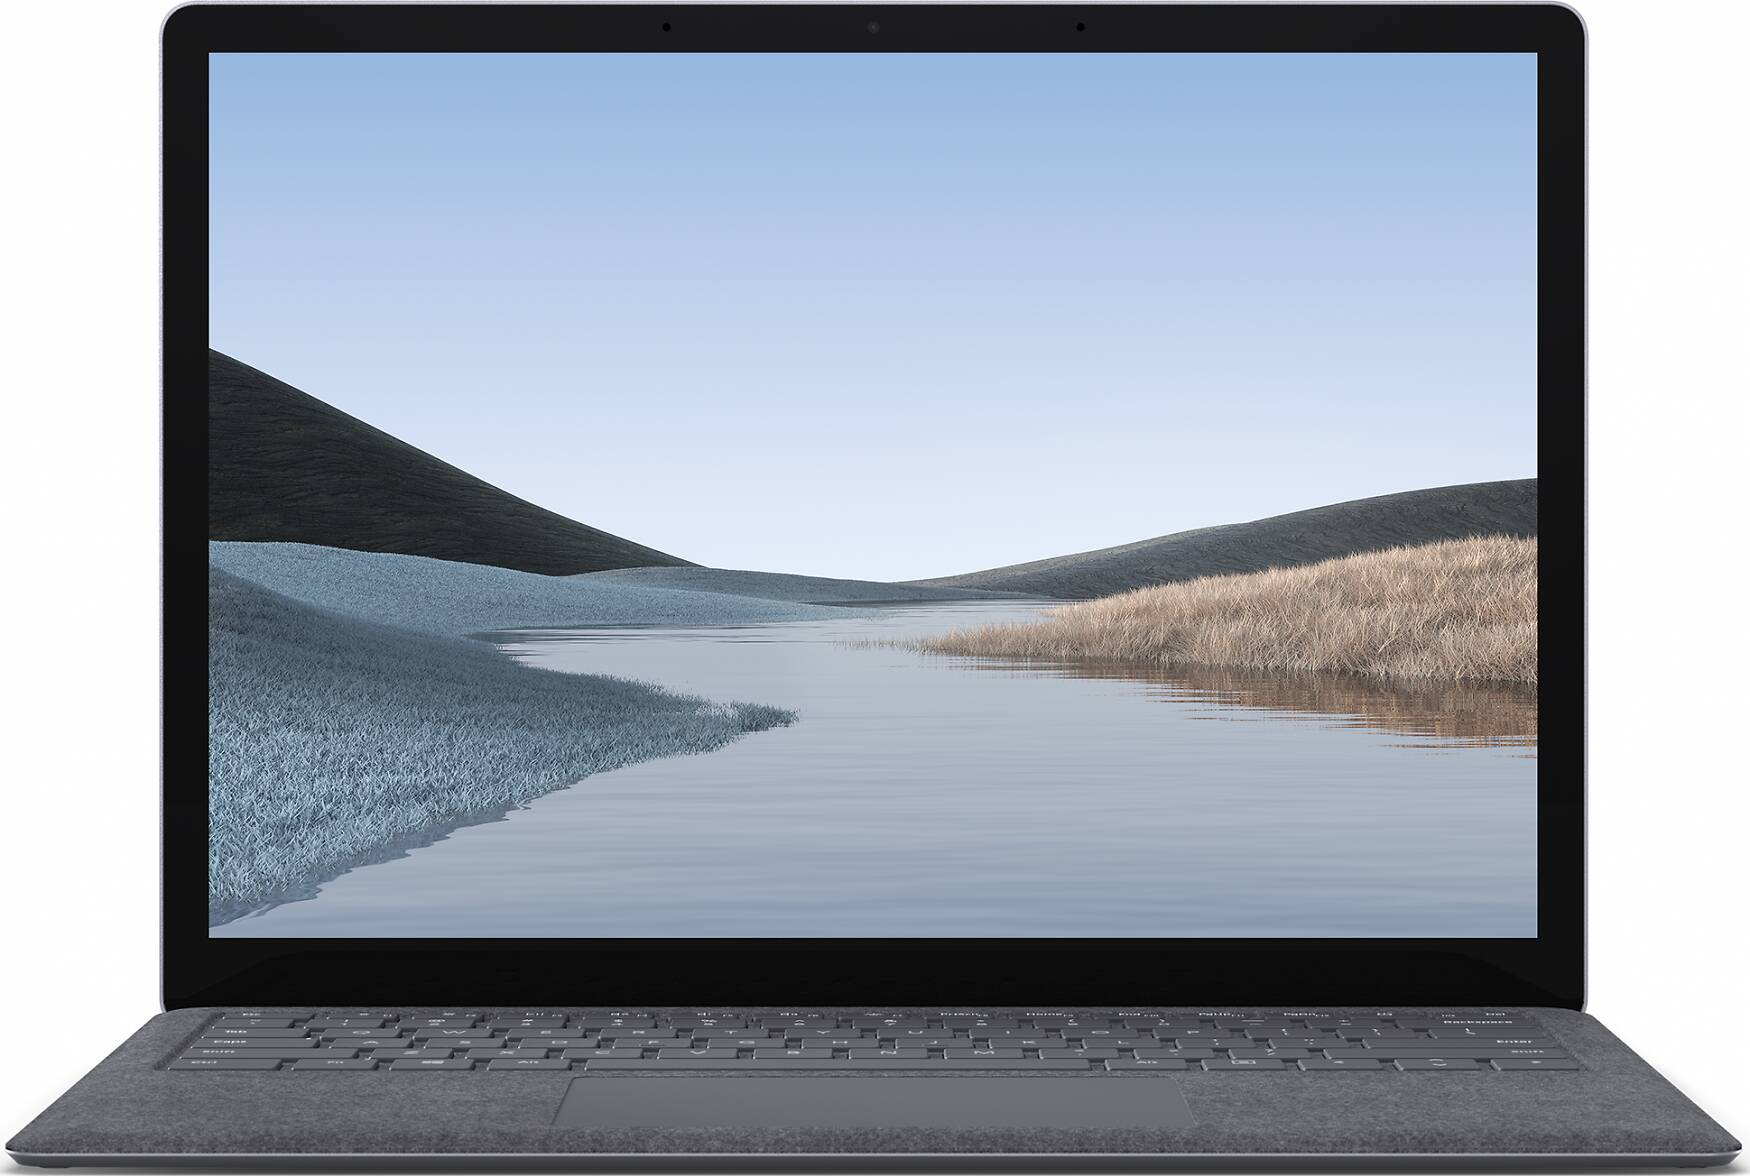 Microsoft Surface Laptop 3 15 Zoll, Core i5, 8GB RAM, 256GB SSD, Platin